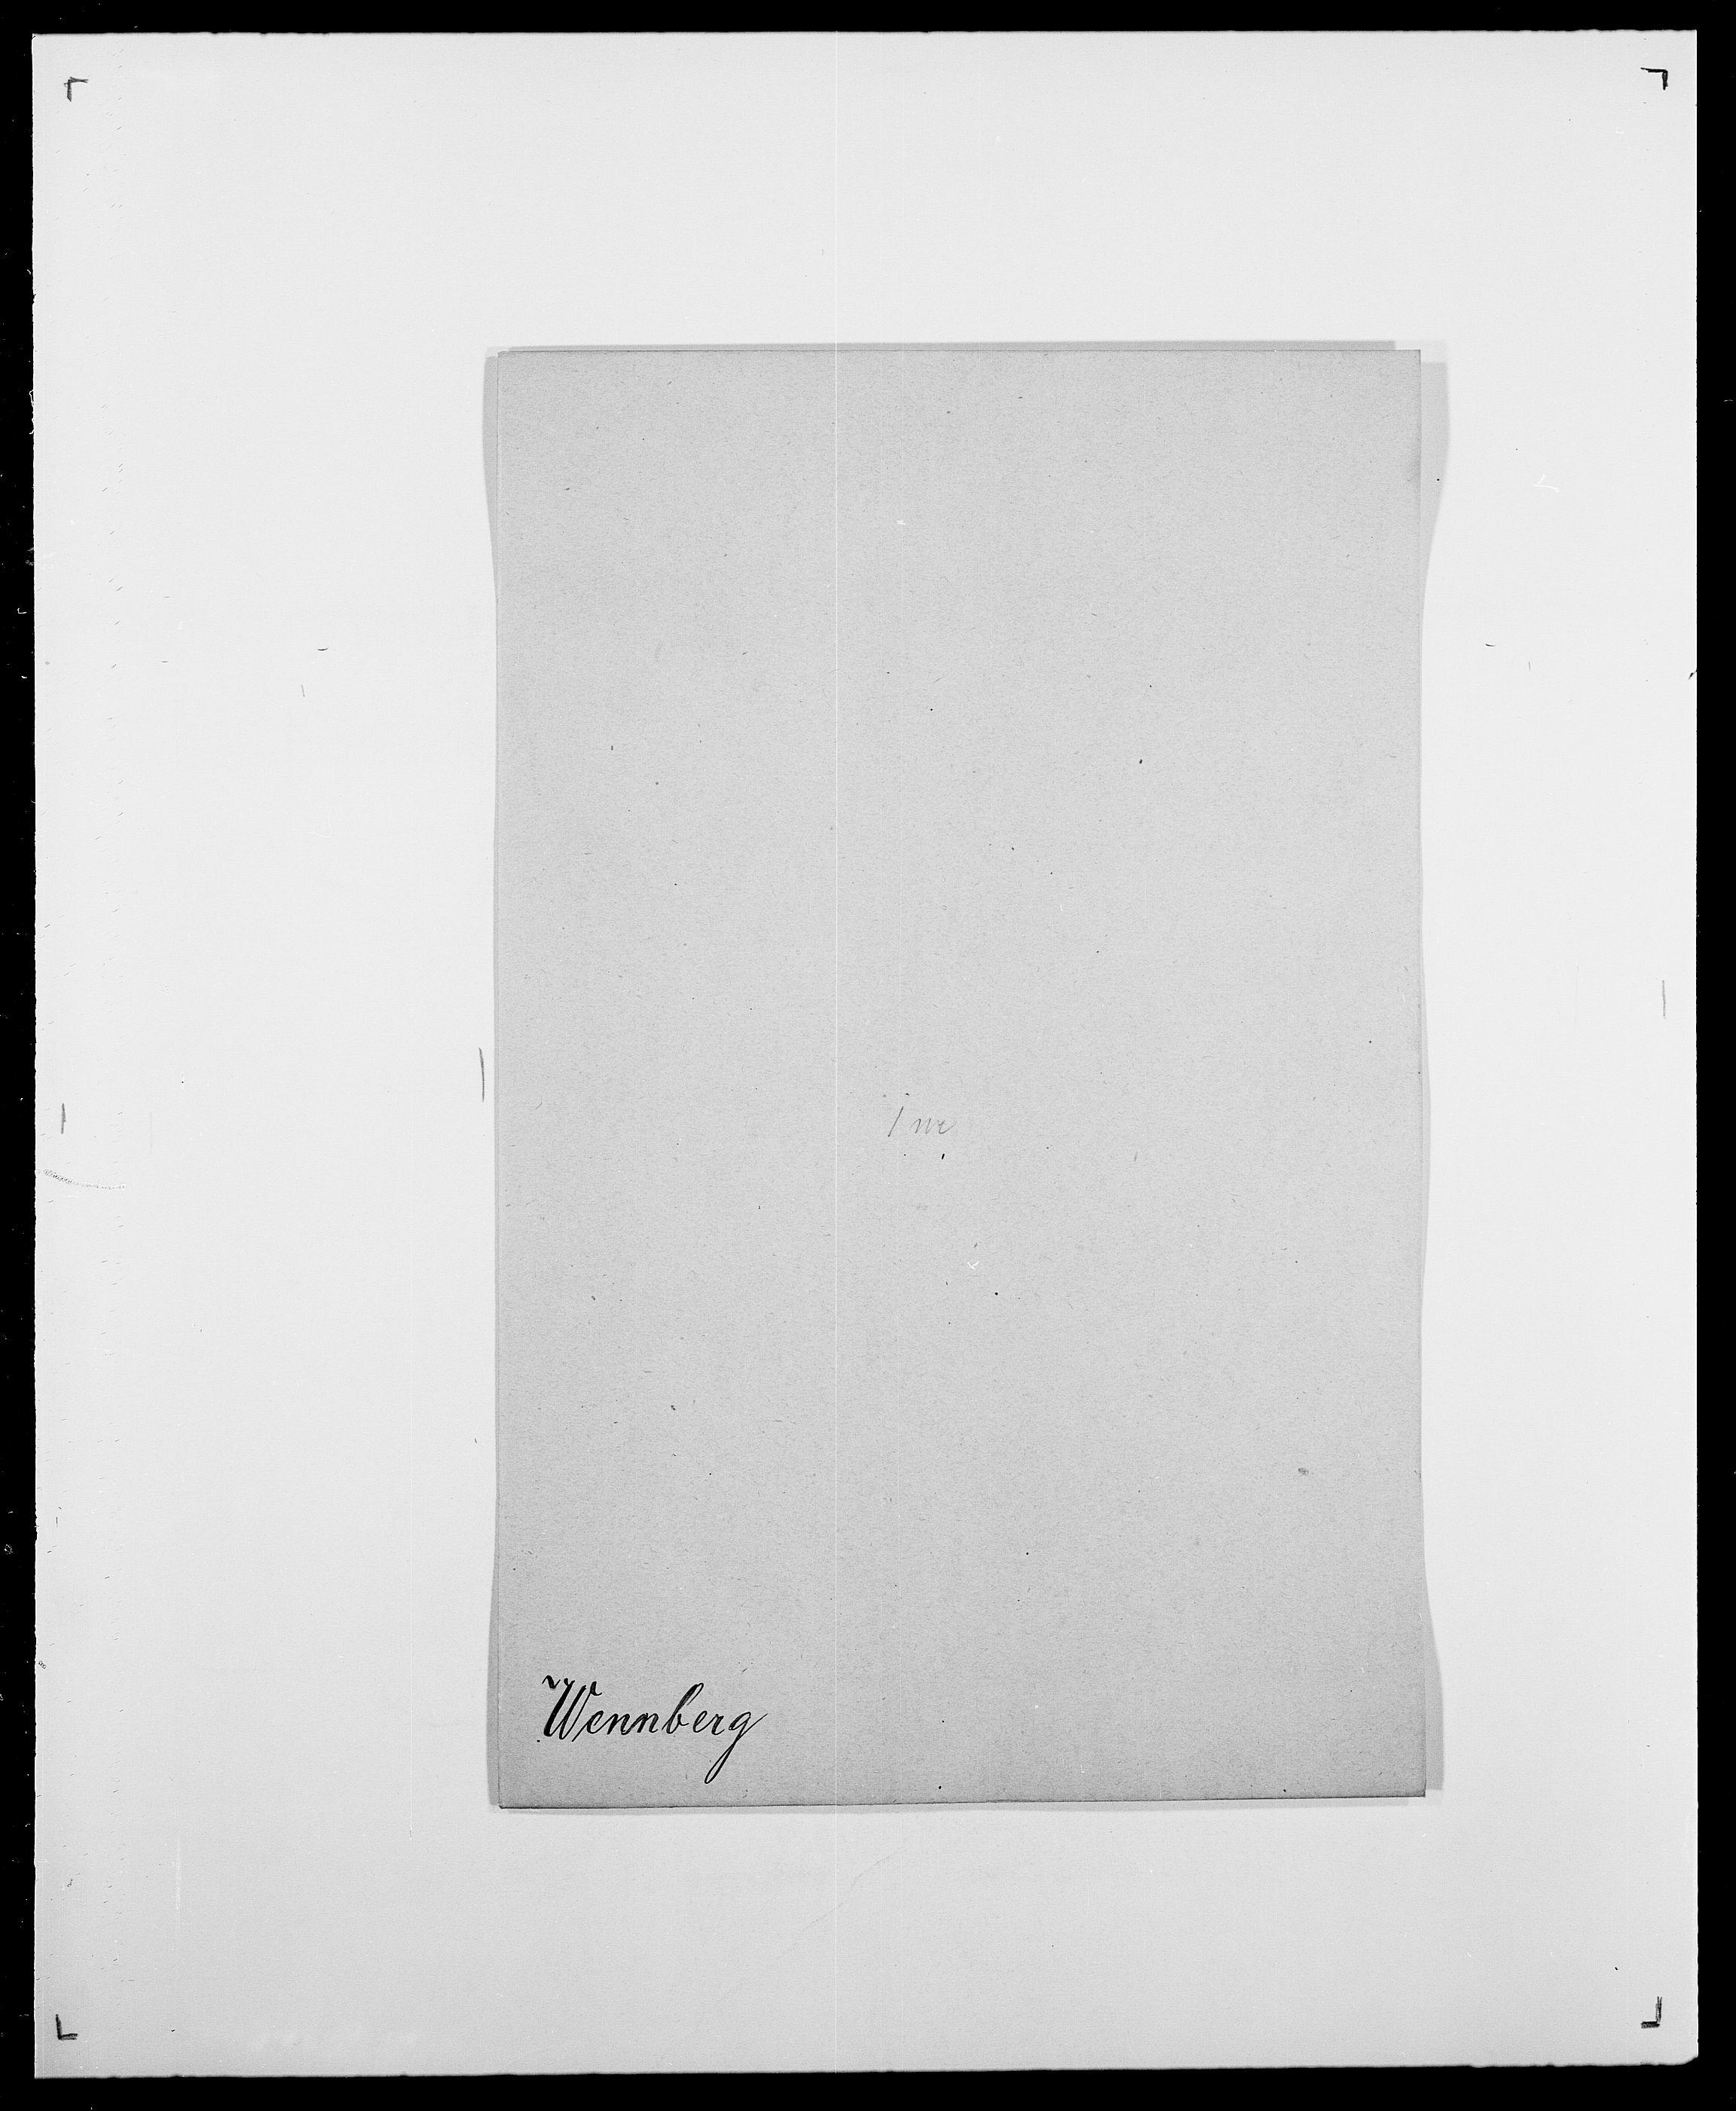 SAO, Delgobe, Charles Antoine - samling, D/Da/L0041: Vemmestad - Viker, s. 32